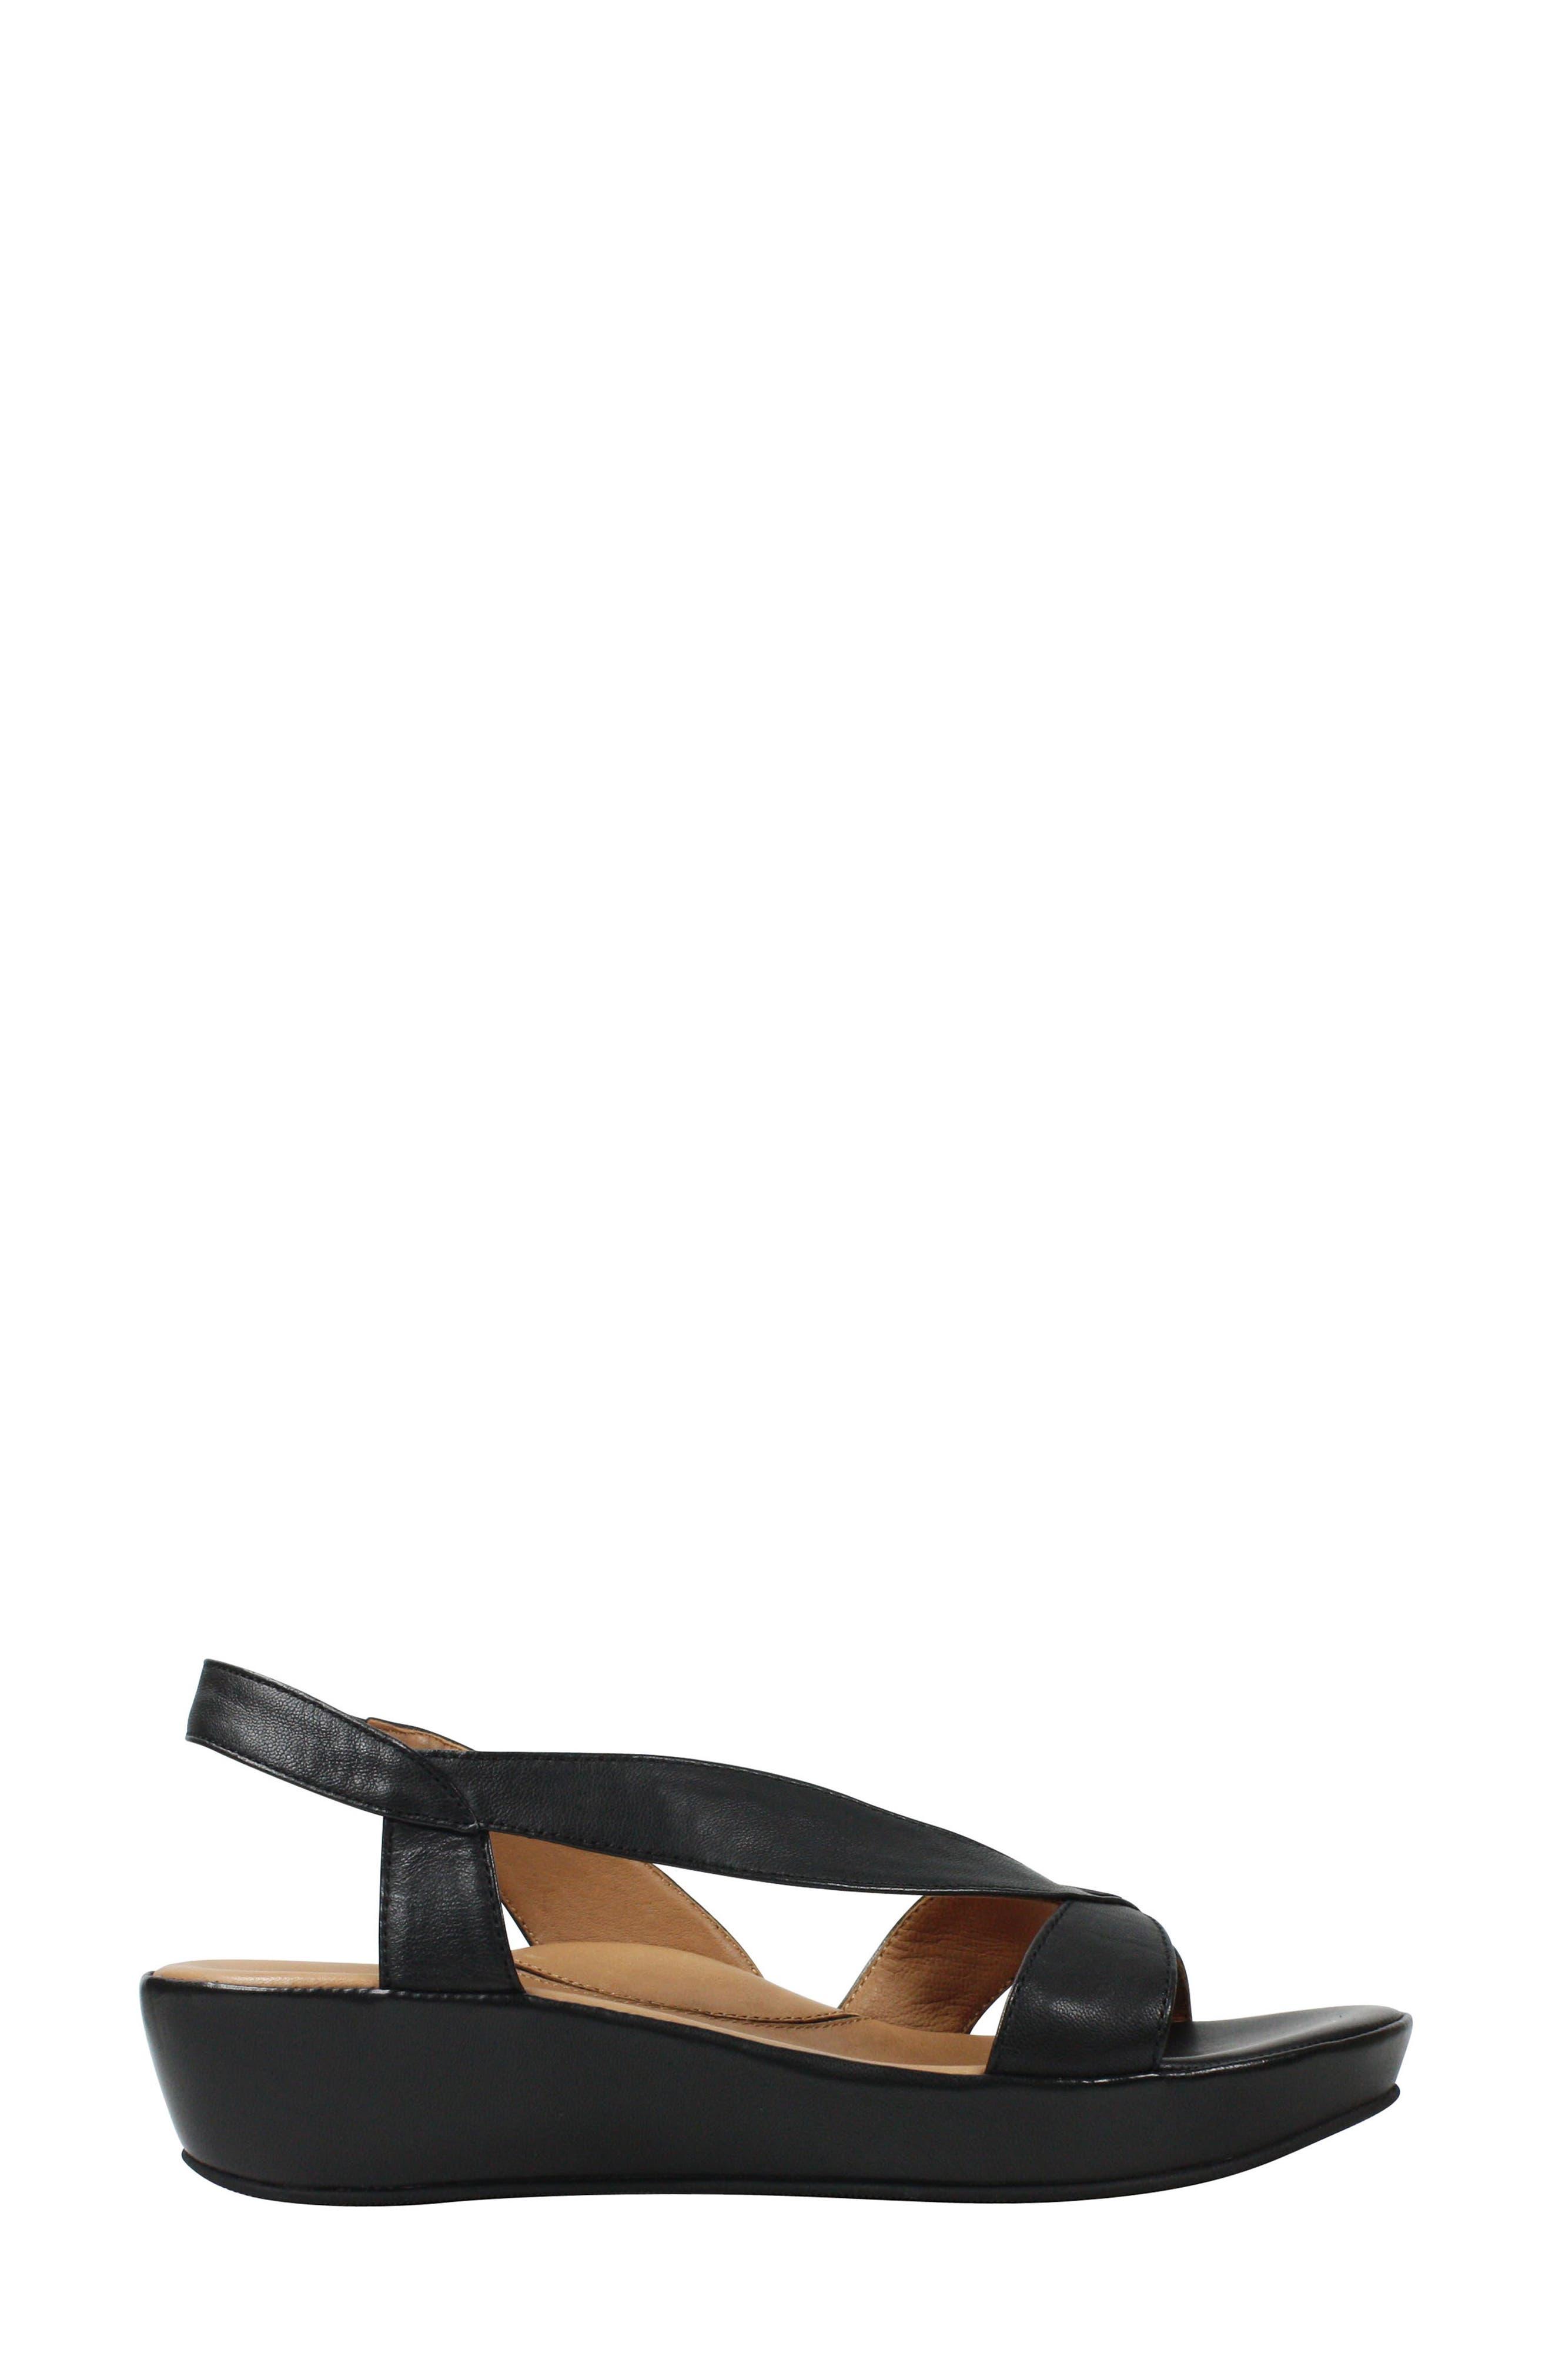 L'AMOUR DES PIEDS, Crotono Sandal, Alternate thumbnail 3, color, BLACK NAPPA LEATHER